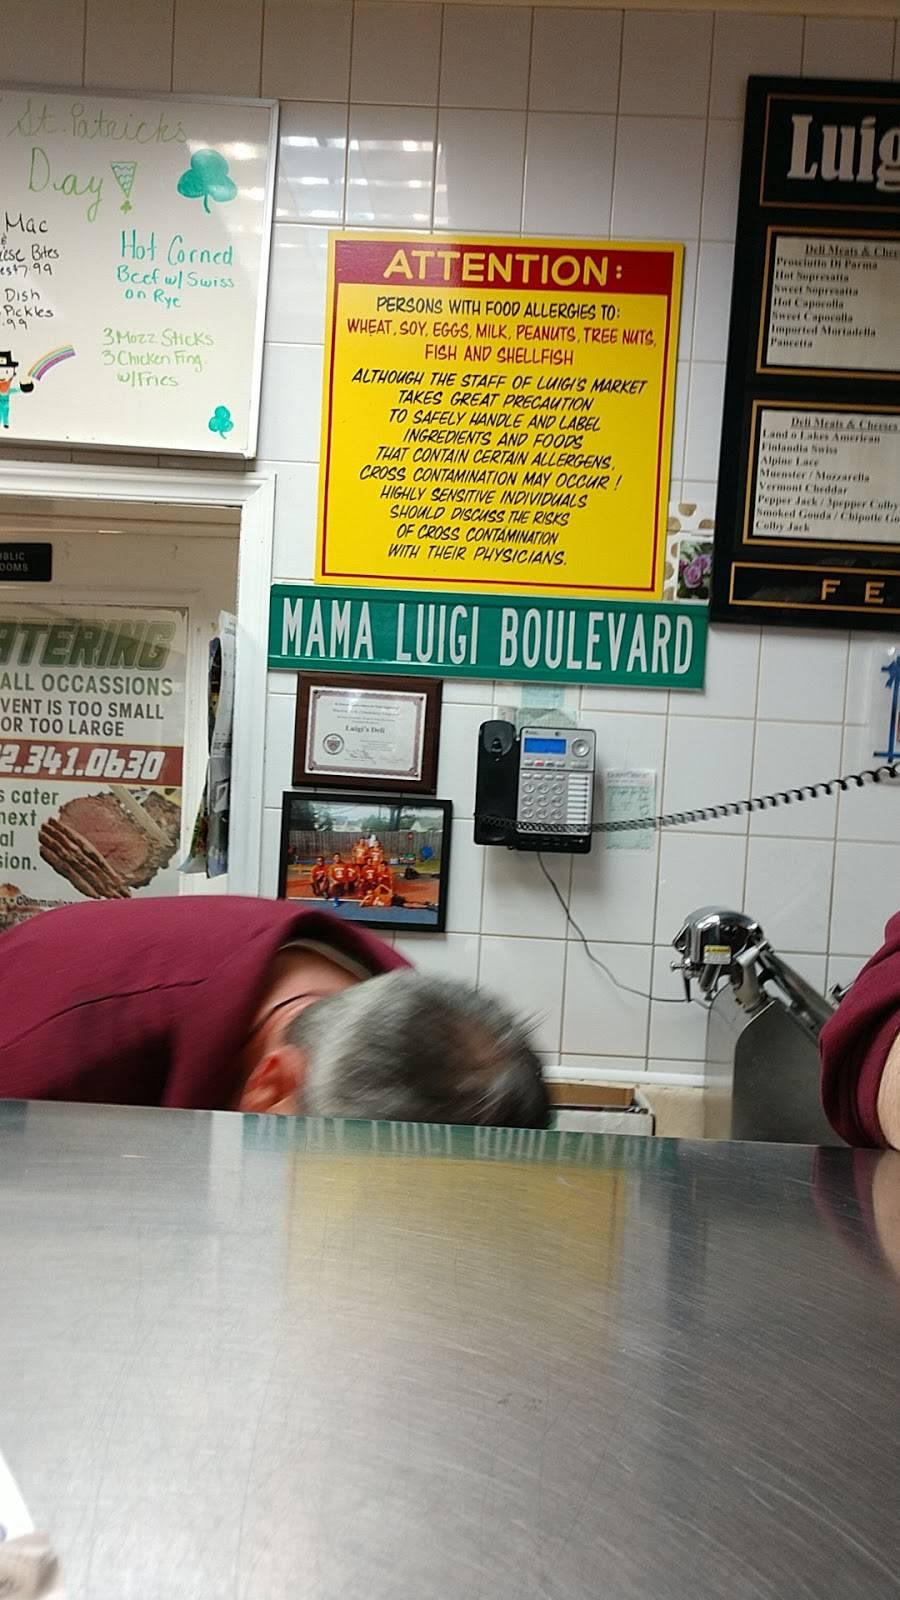 Luigi Deli Meat Market | restaurant | 424 Dover Rd, Toms River, NJ 08757, USA | 7323410630 OR +1 732-341-0630